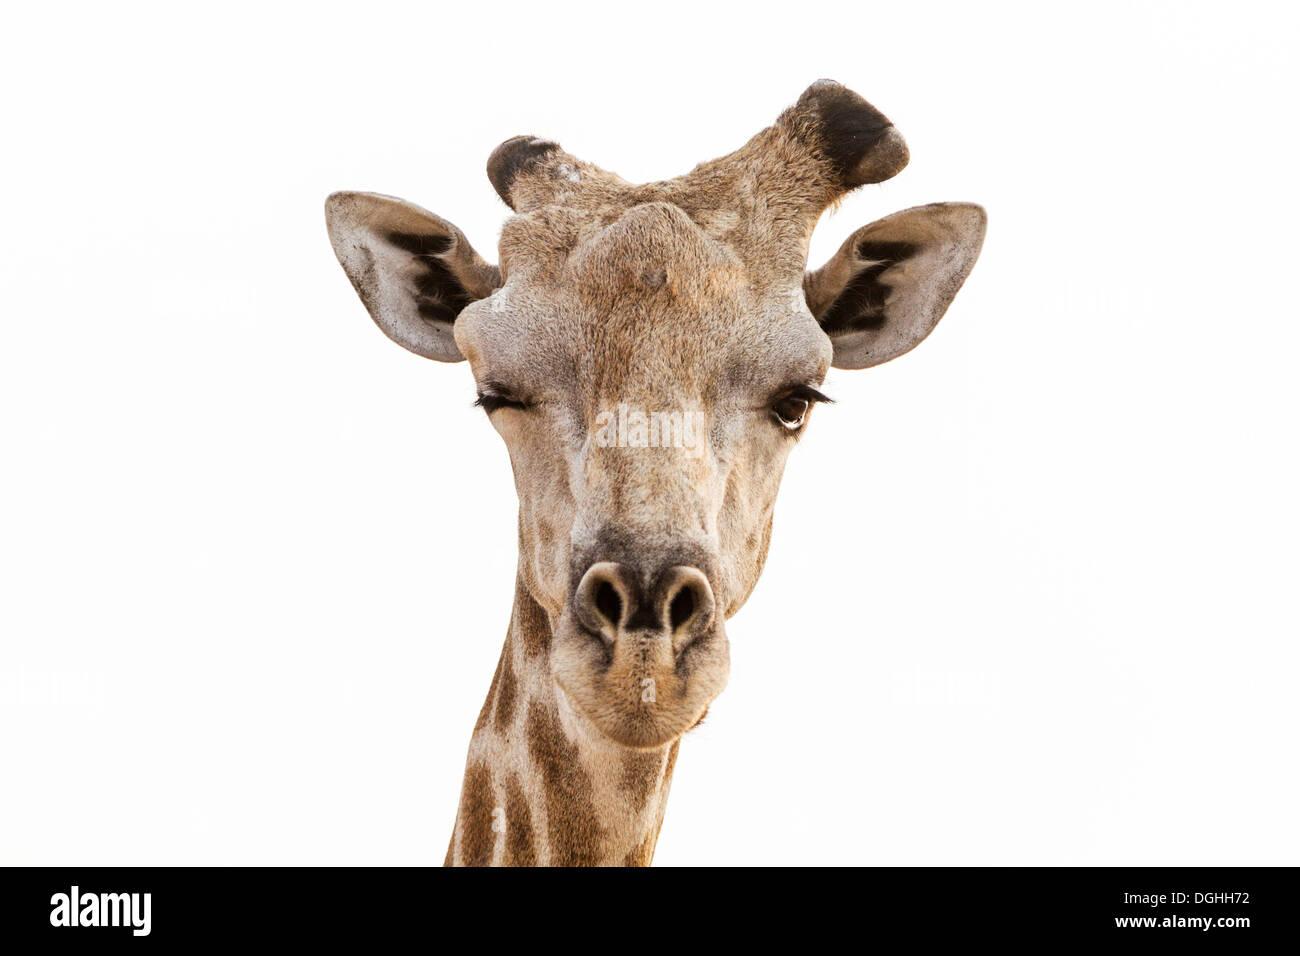 Close-up of adult male Giraffe winking, Chobe National Park, Botswana - Stock Image